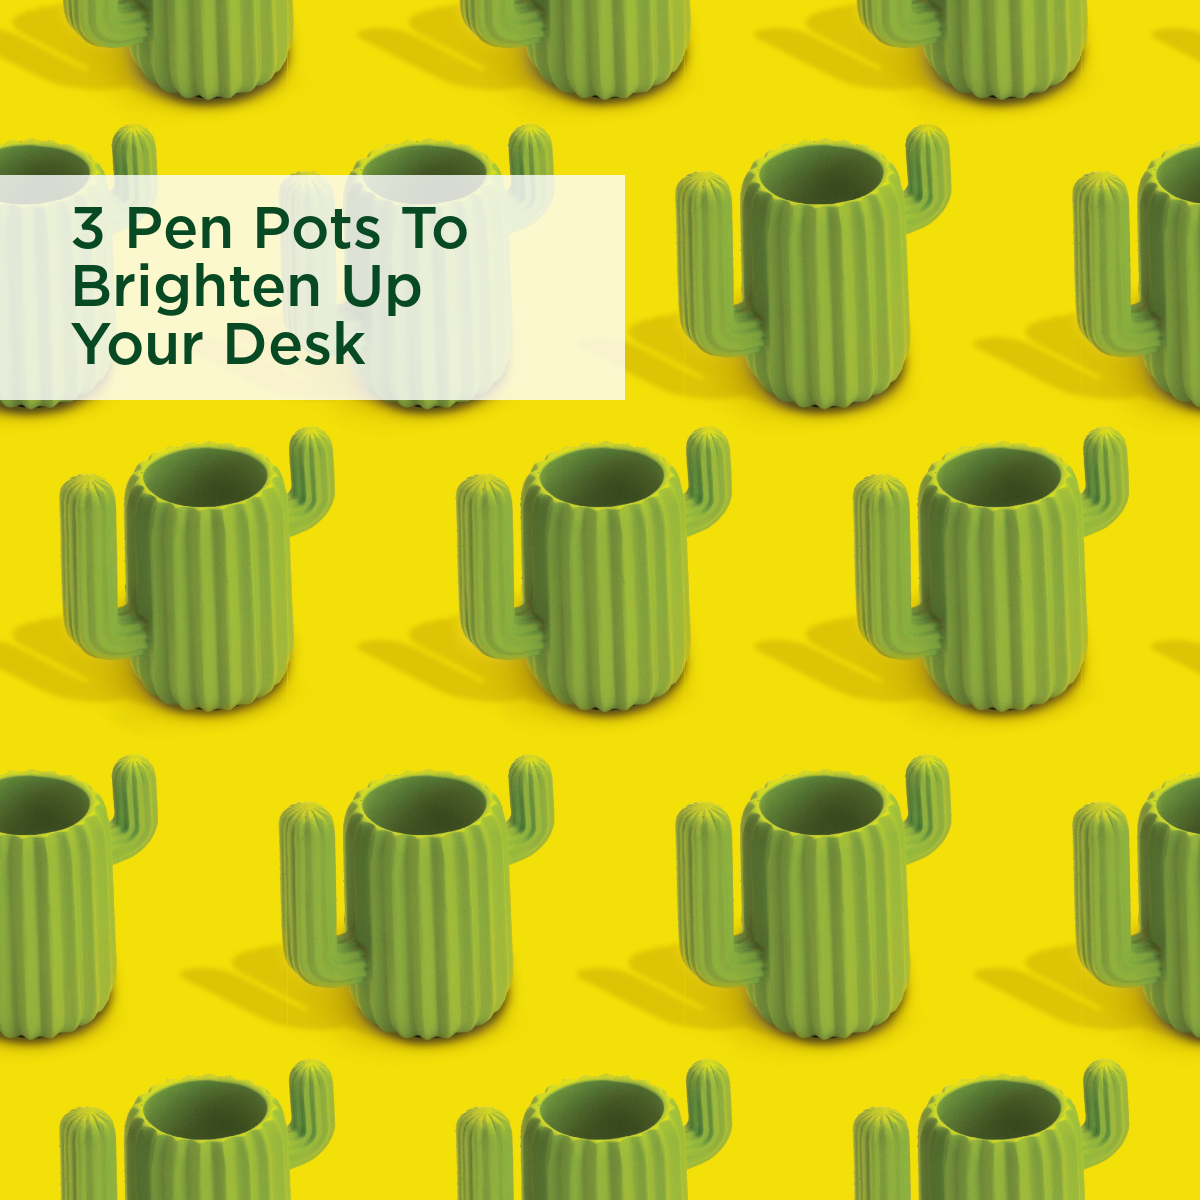 3 Pen Pots To Brighten Up Your Desk